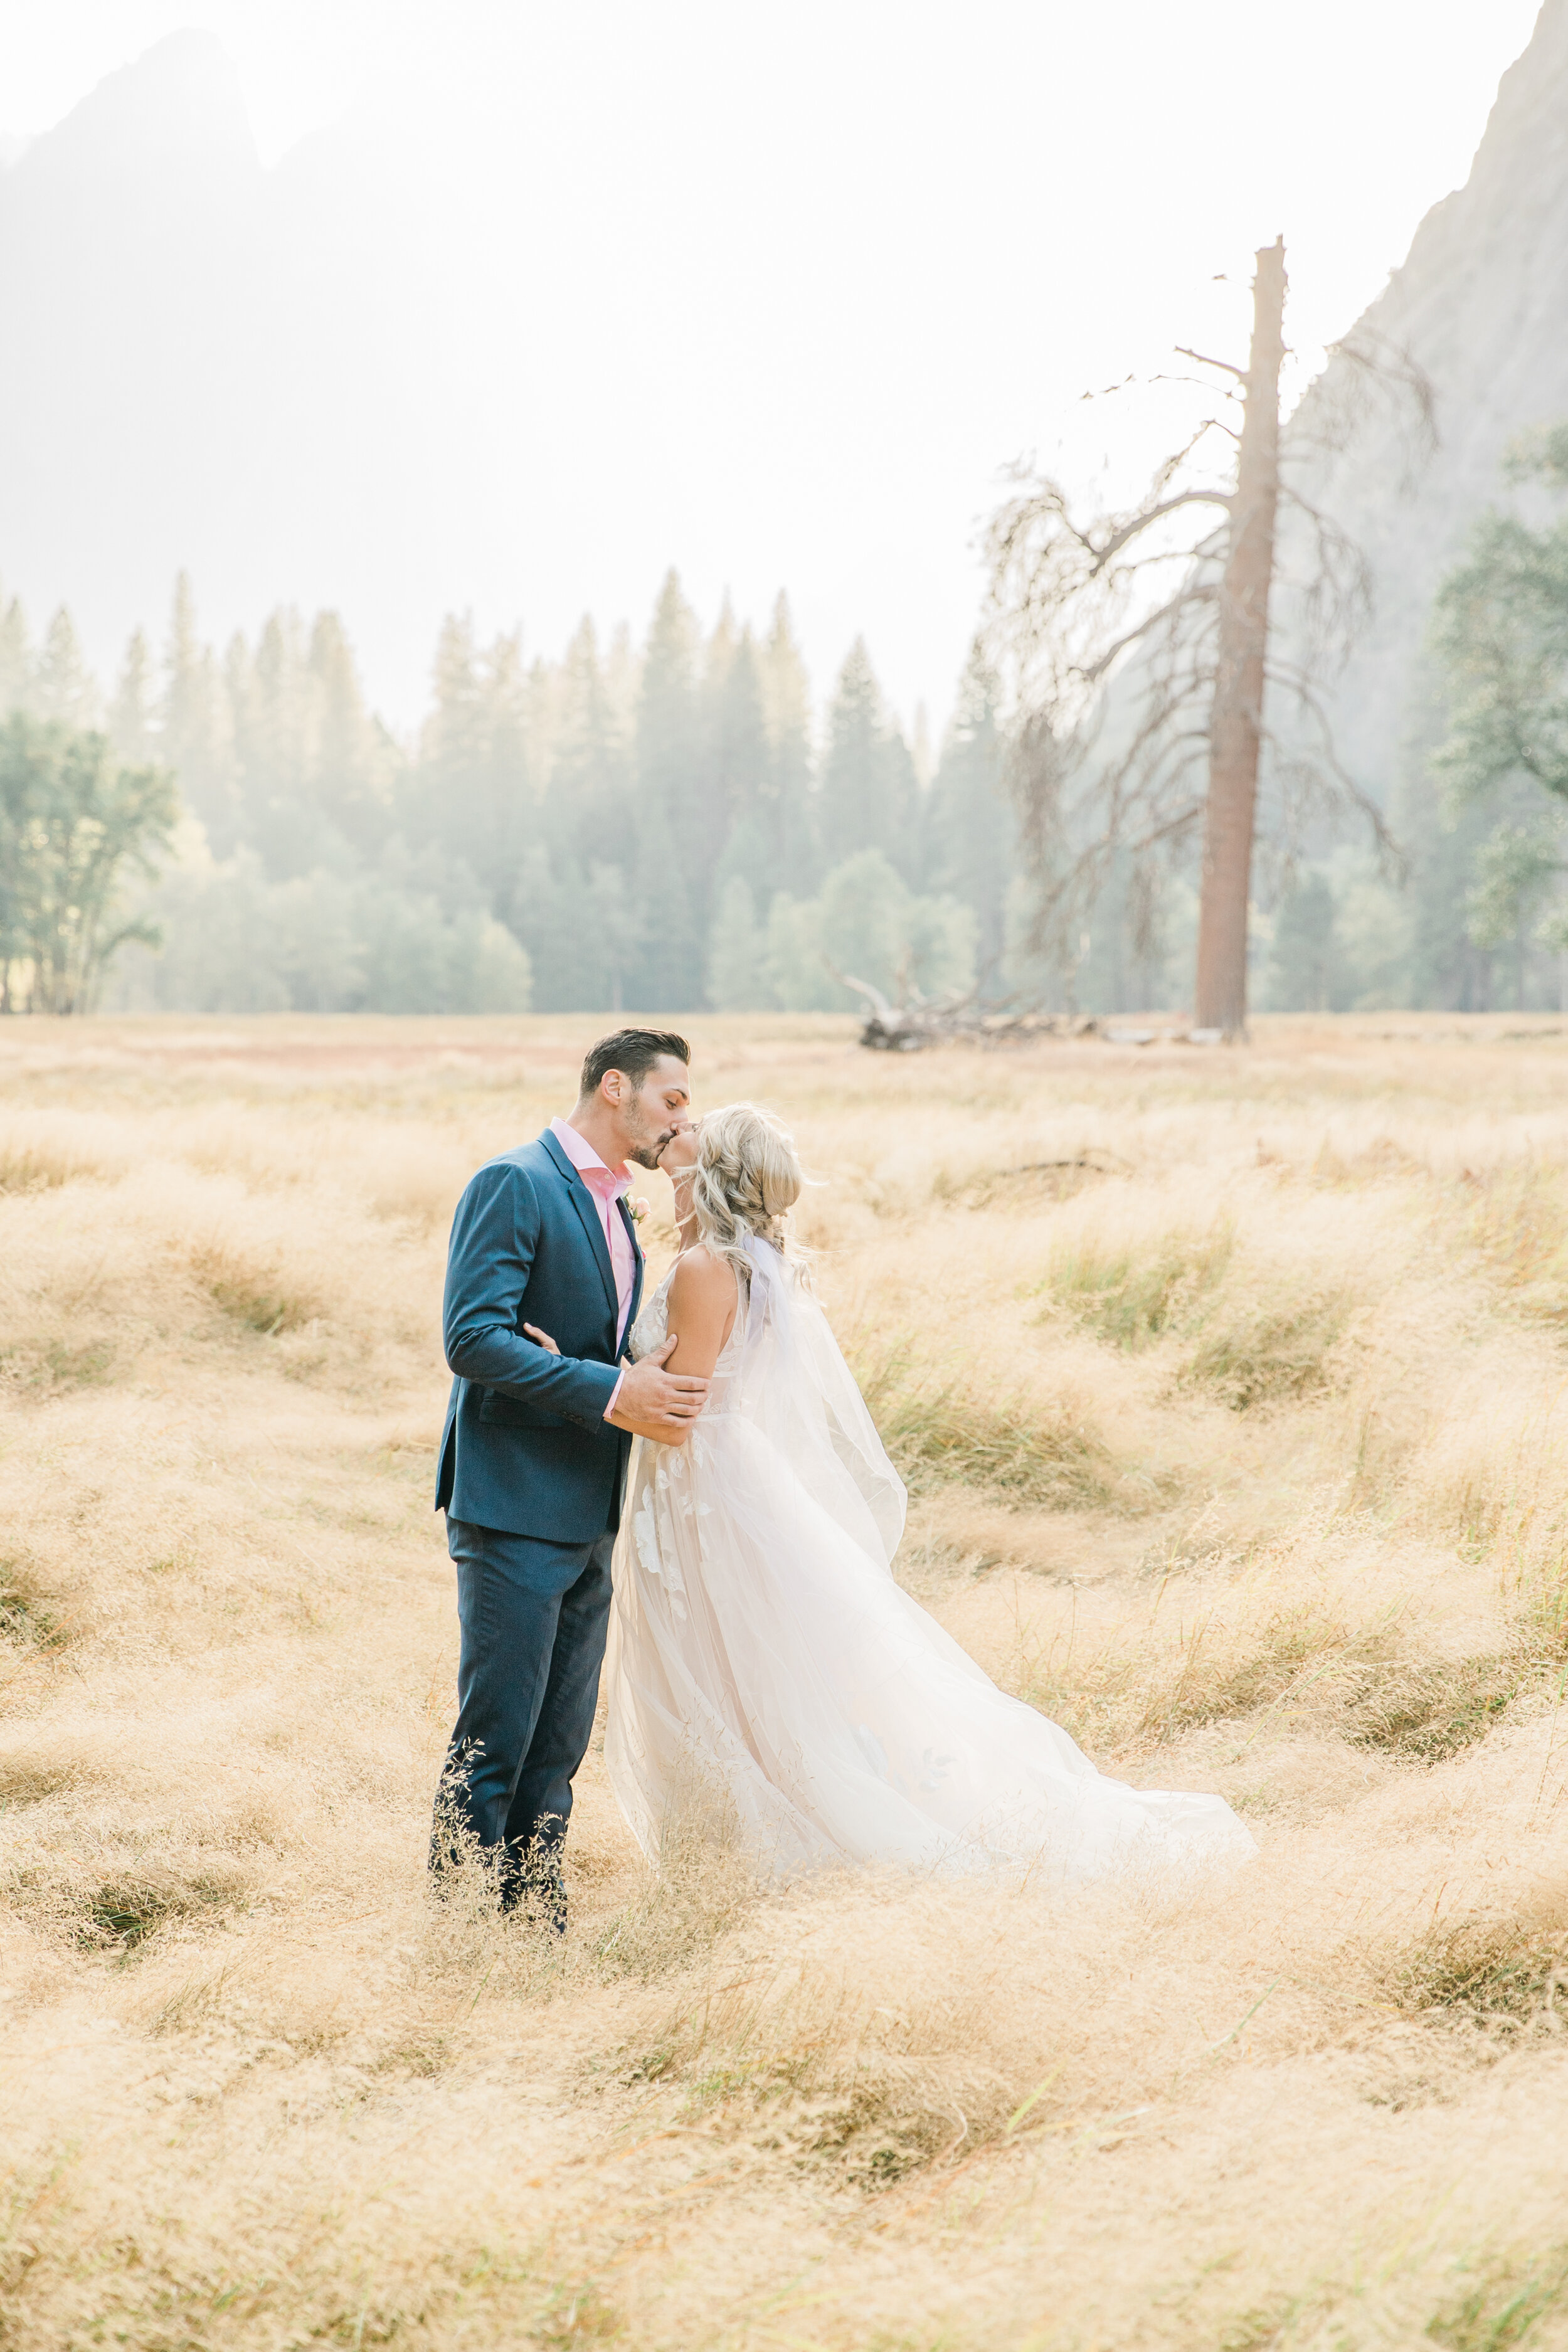 Leanne and Joe - Married - Sneak Peeks - Lauren Alisse Photography-36.jpg